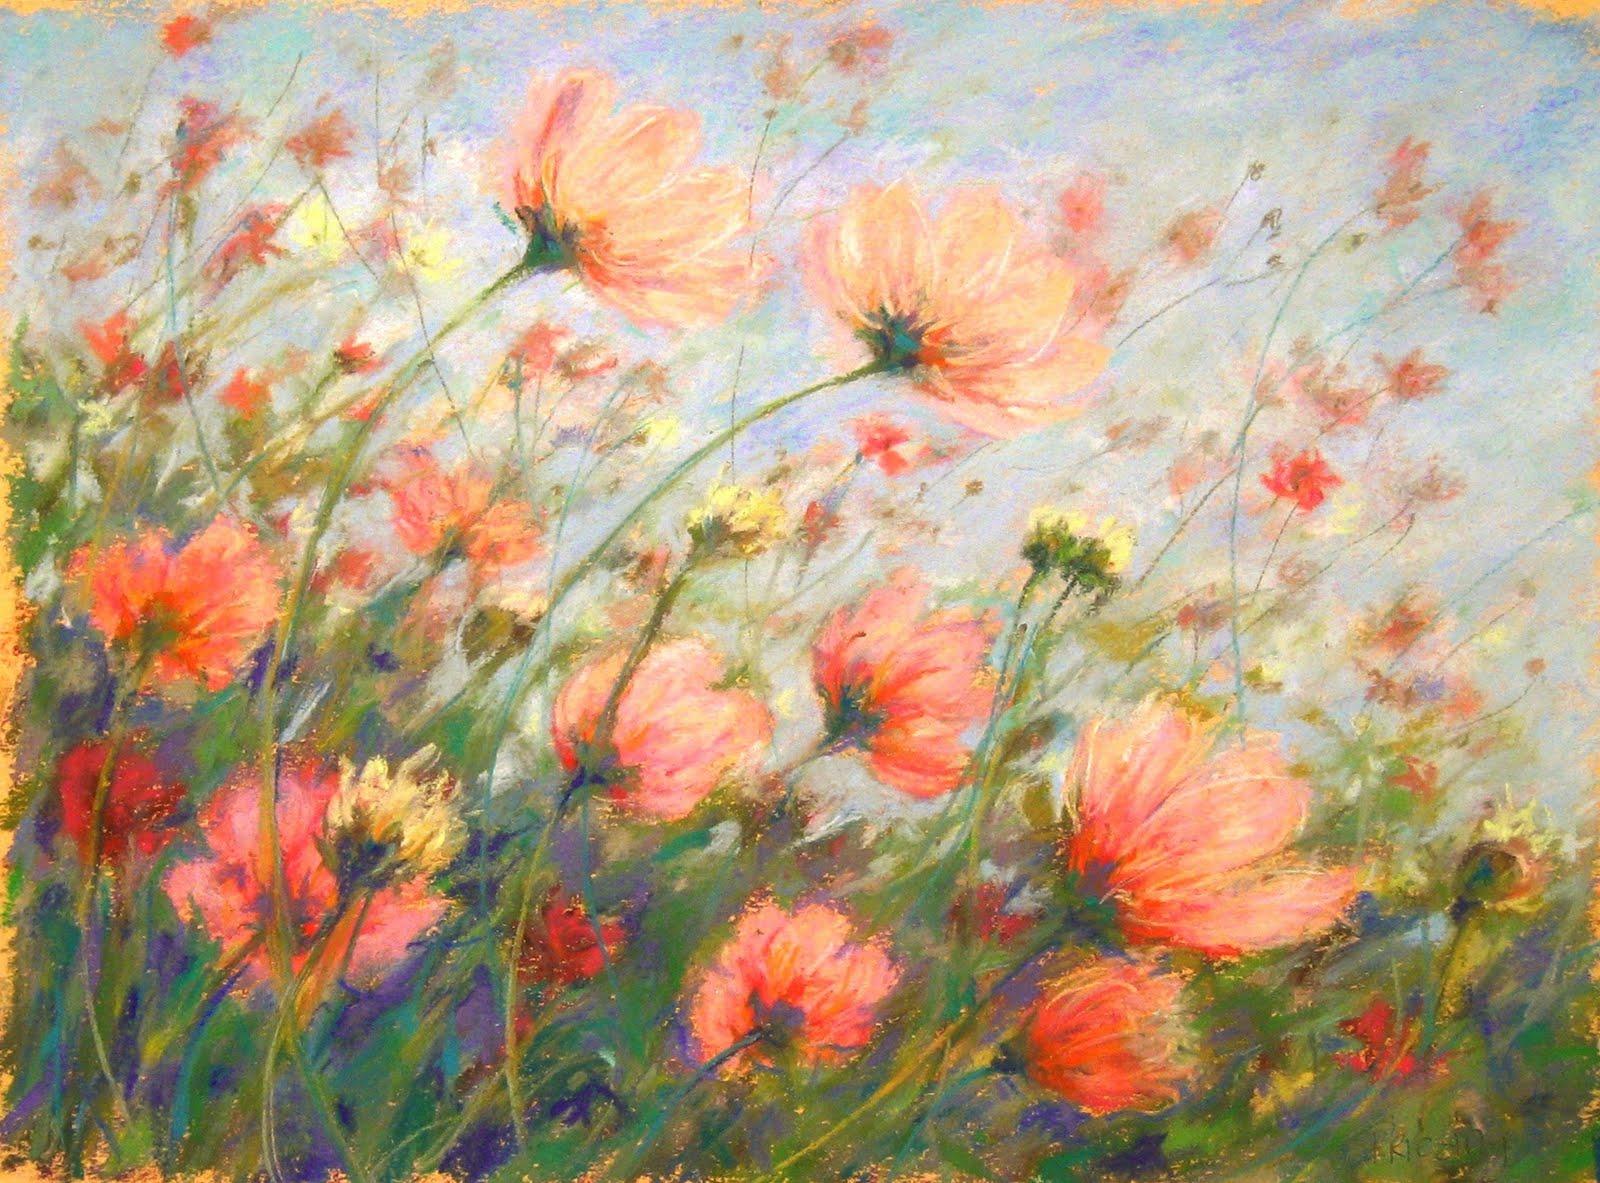 http://1.bp.blogspot.com/_6l_blynjtHw/S8n7kRgsntI/AAAAAAAAGcM/i7JswHCy4qw/s1600/blowing%2Bflowers.JPG